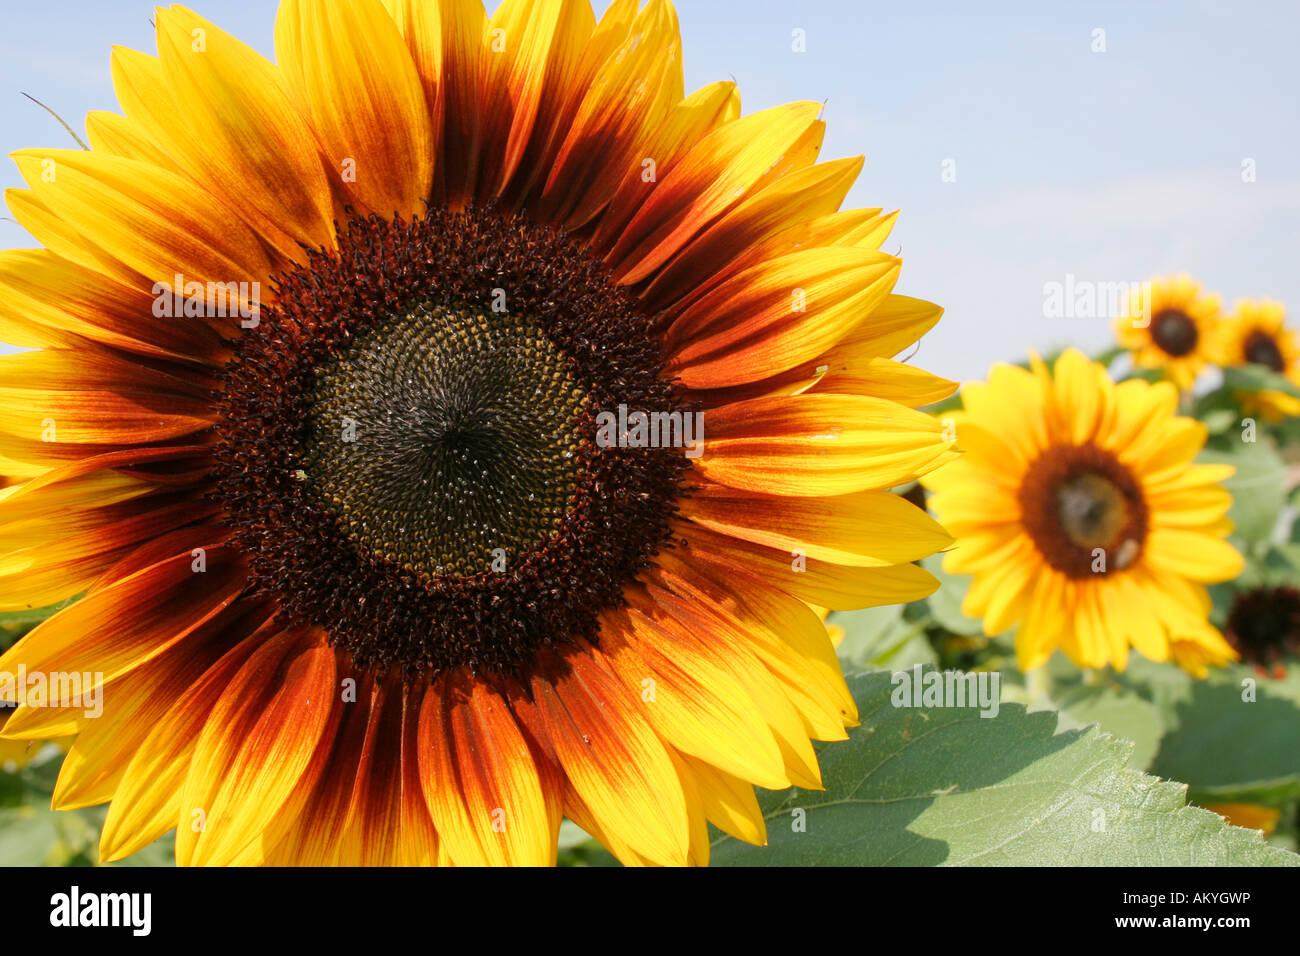 Le tournesol (Helianthus annuus) Photo Stock